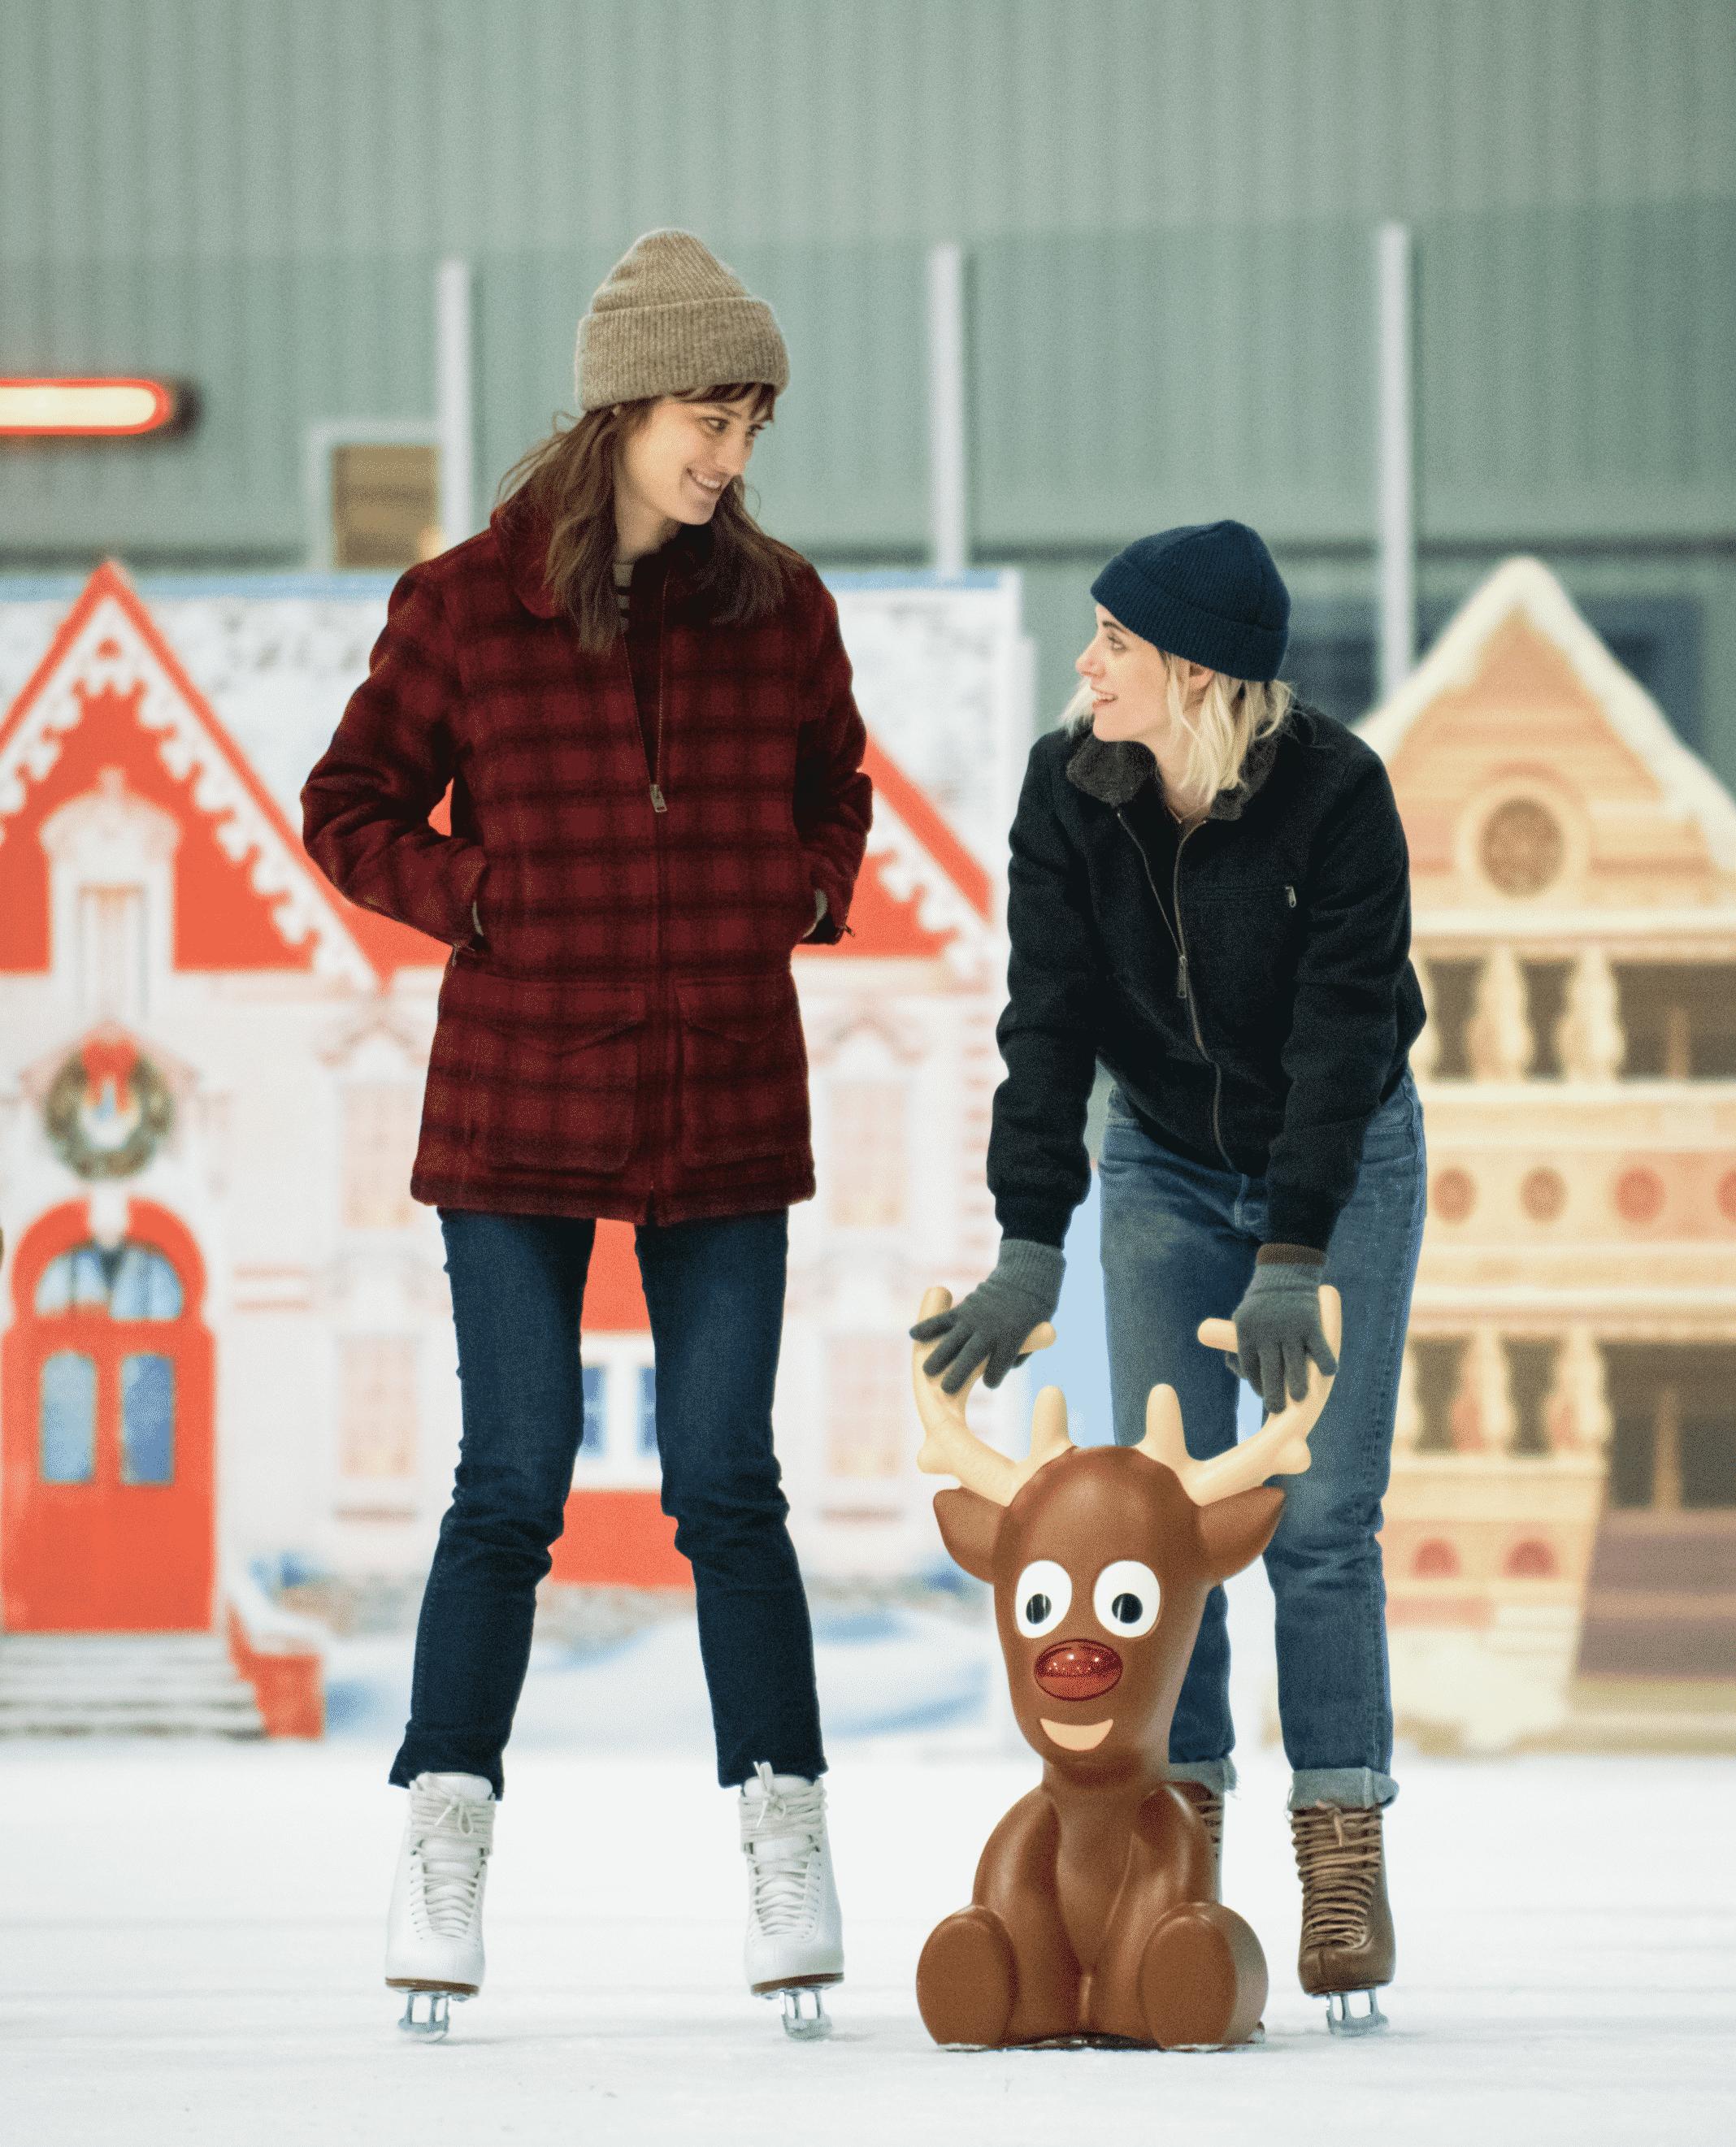 Abby (KRISTEN STEWART, right) and Harper (MACKENZIE DAVIS) enjoy a moment on the ice